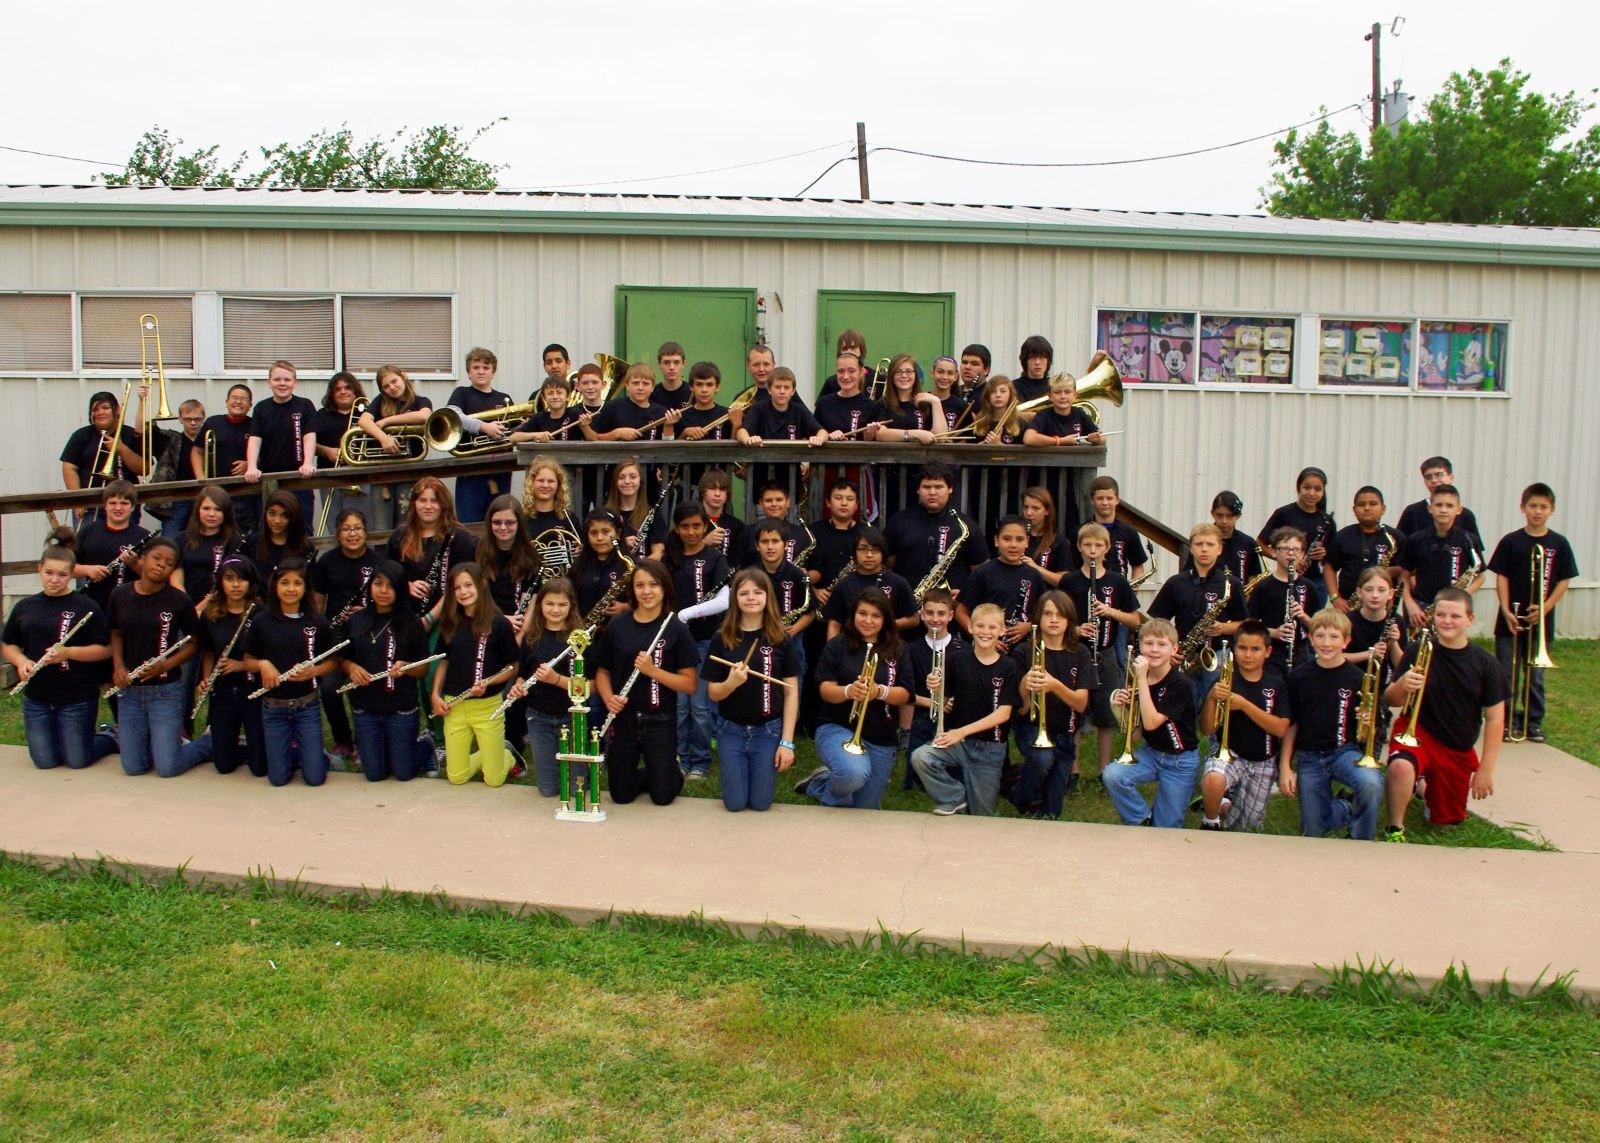 Travis Elementary Band members